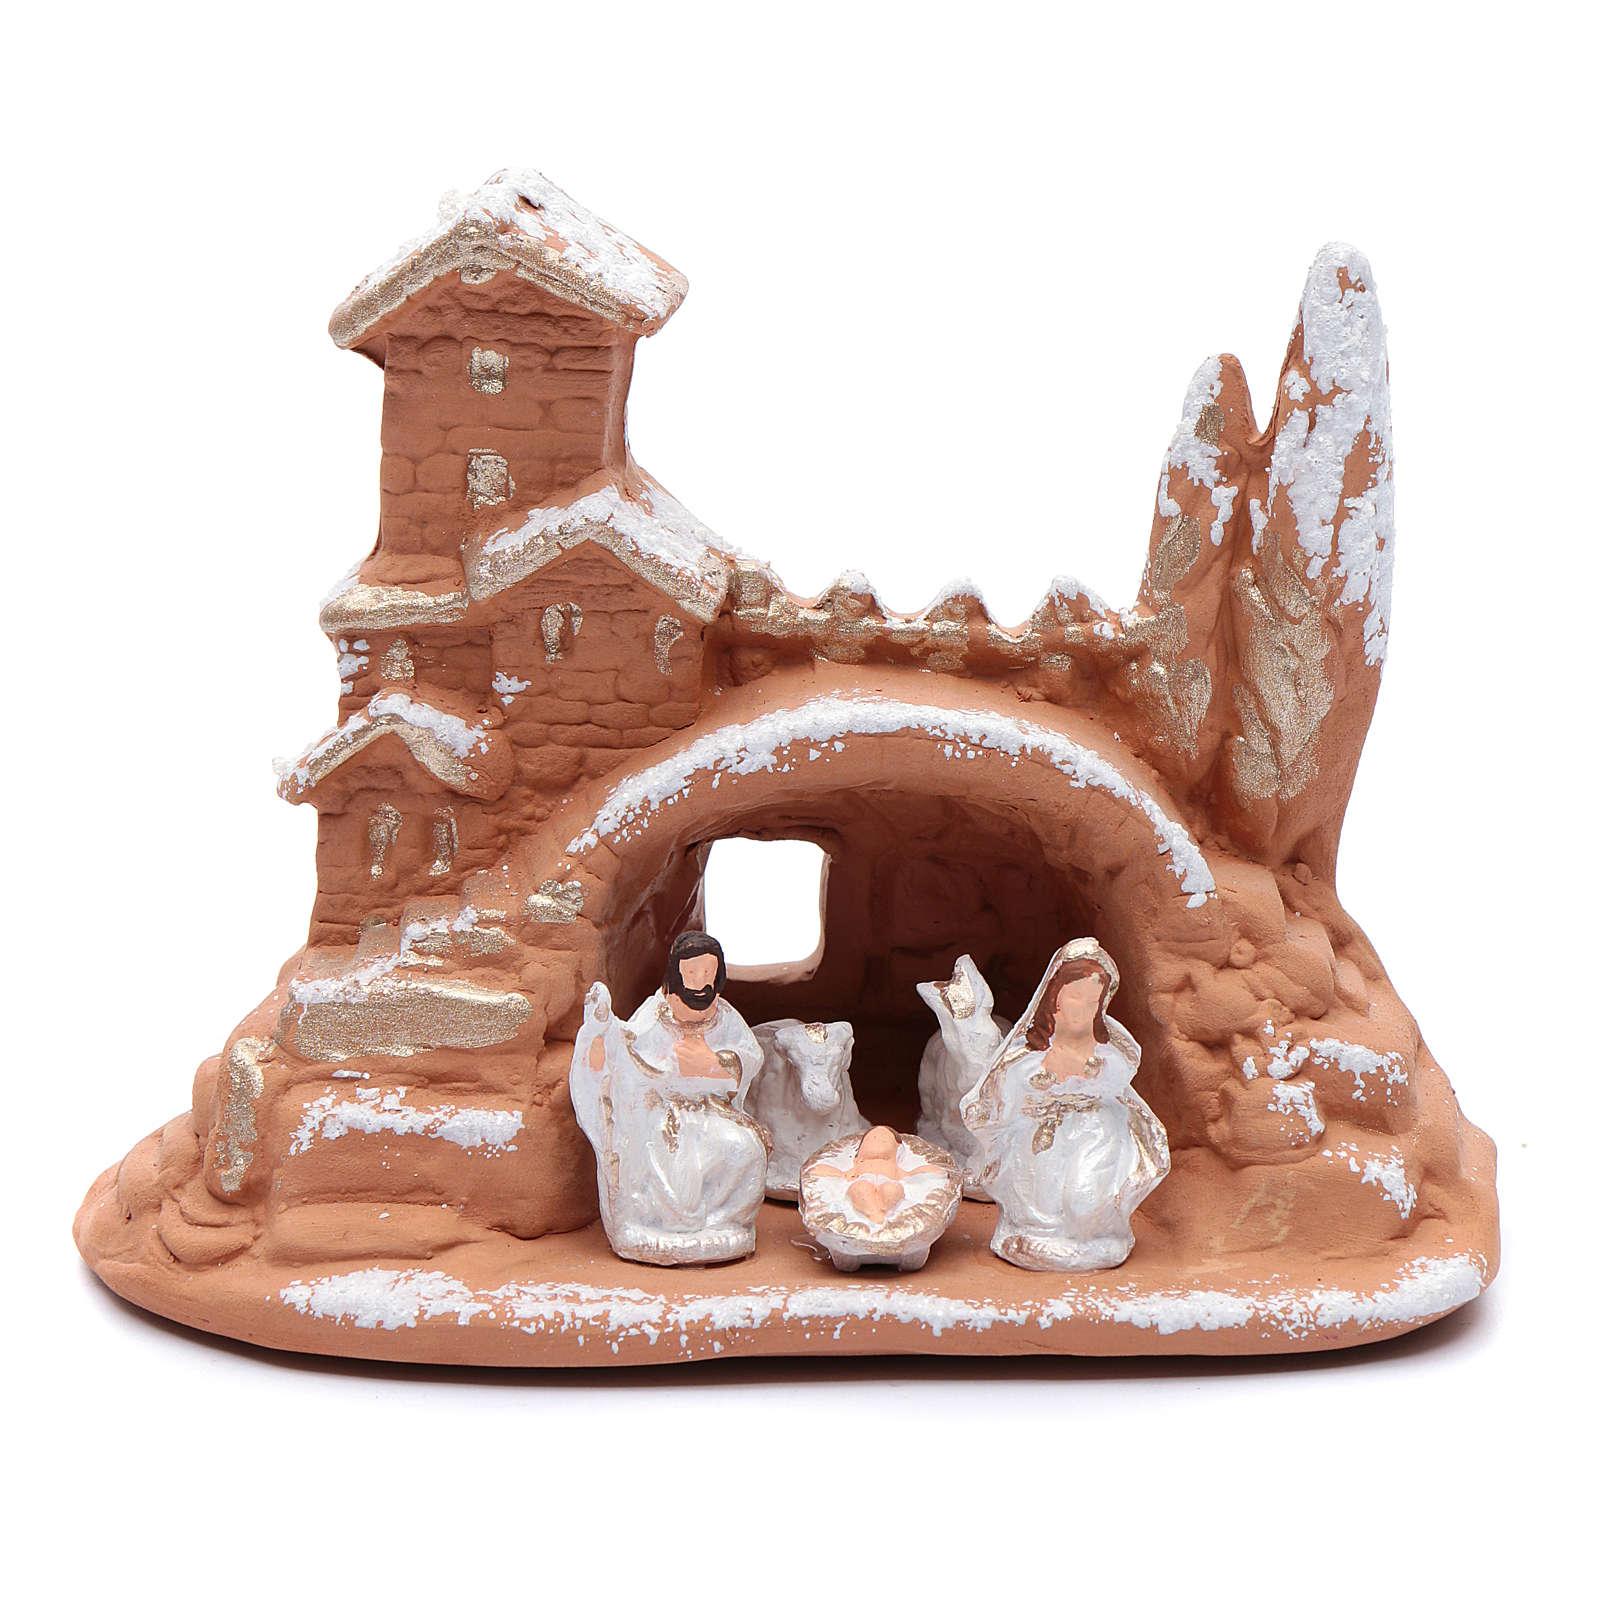 Capanna in terracotta h. 11 cm con neve Deruta 4